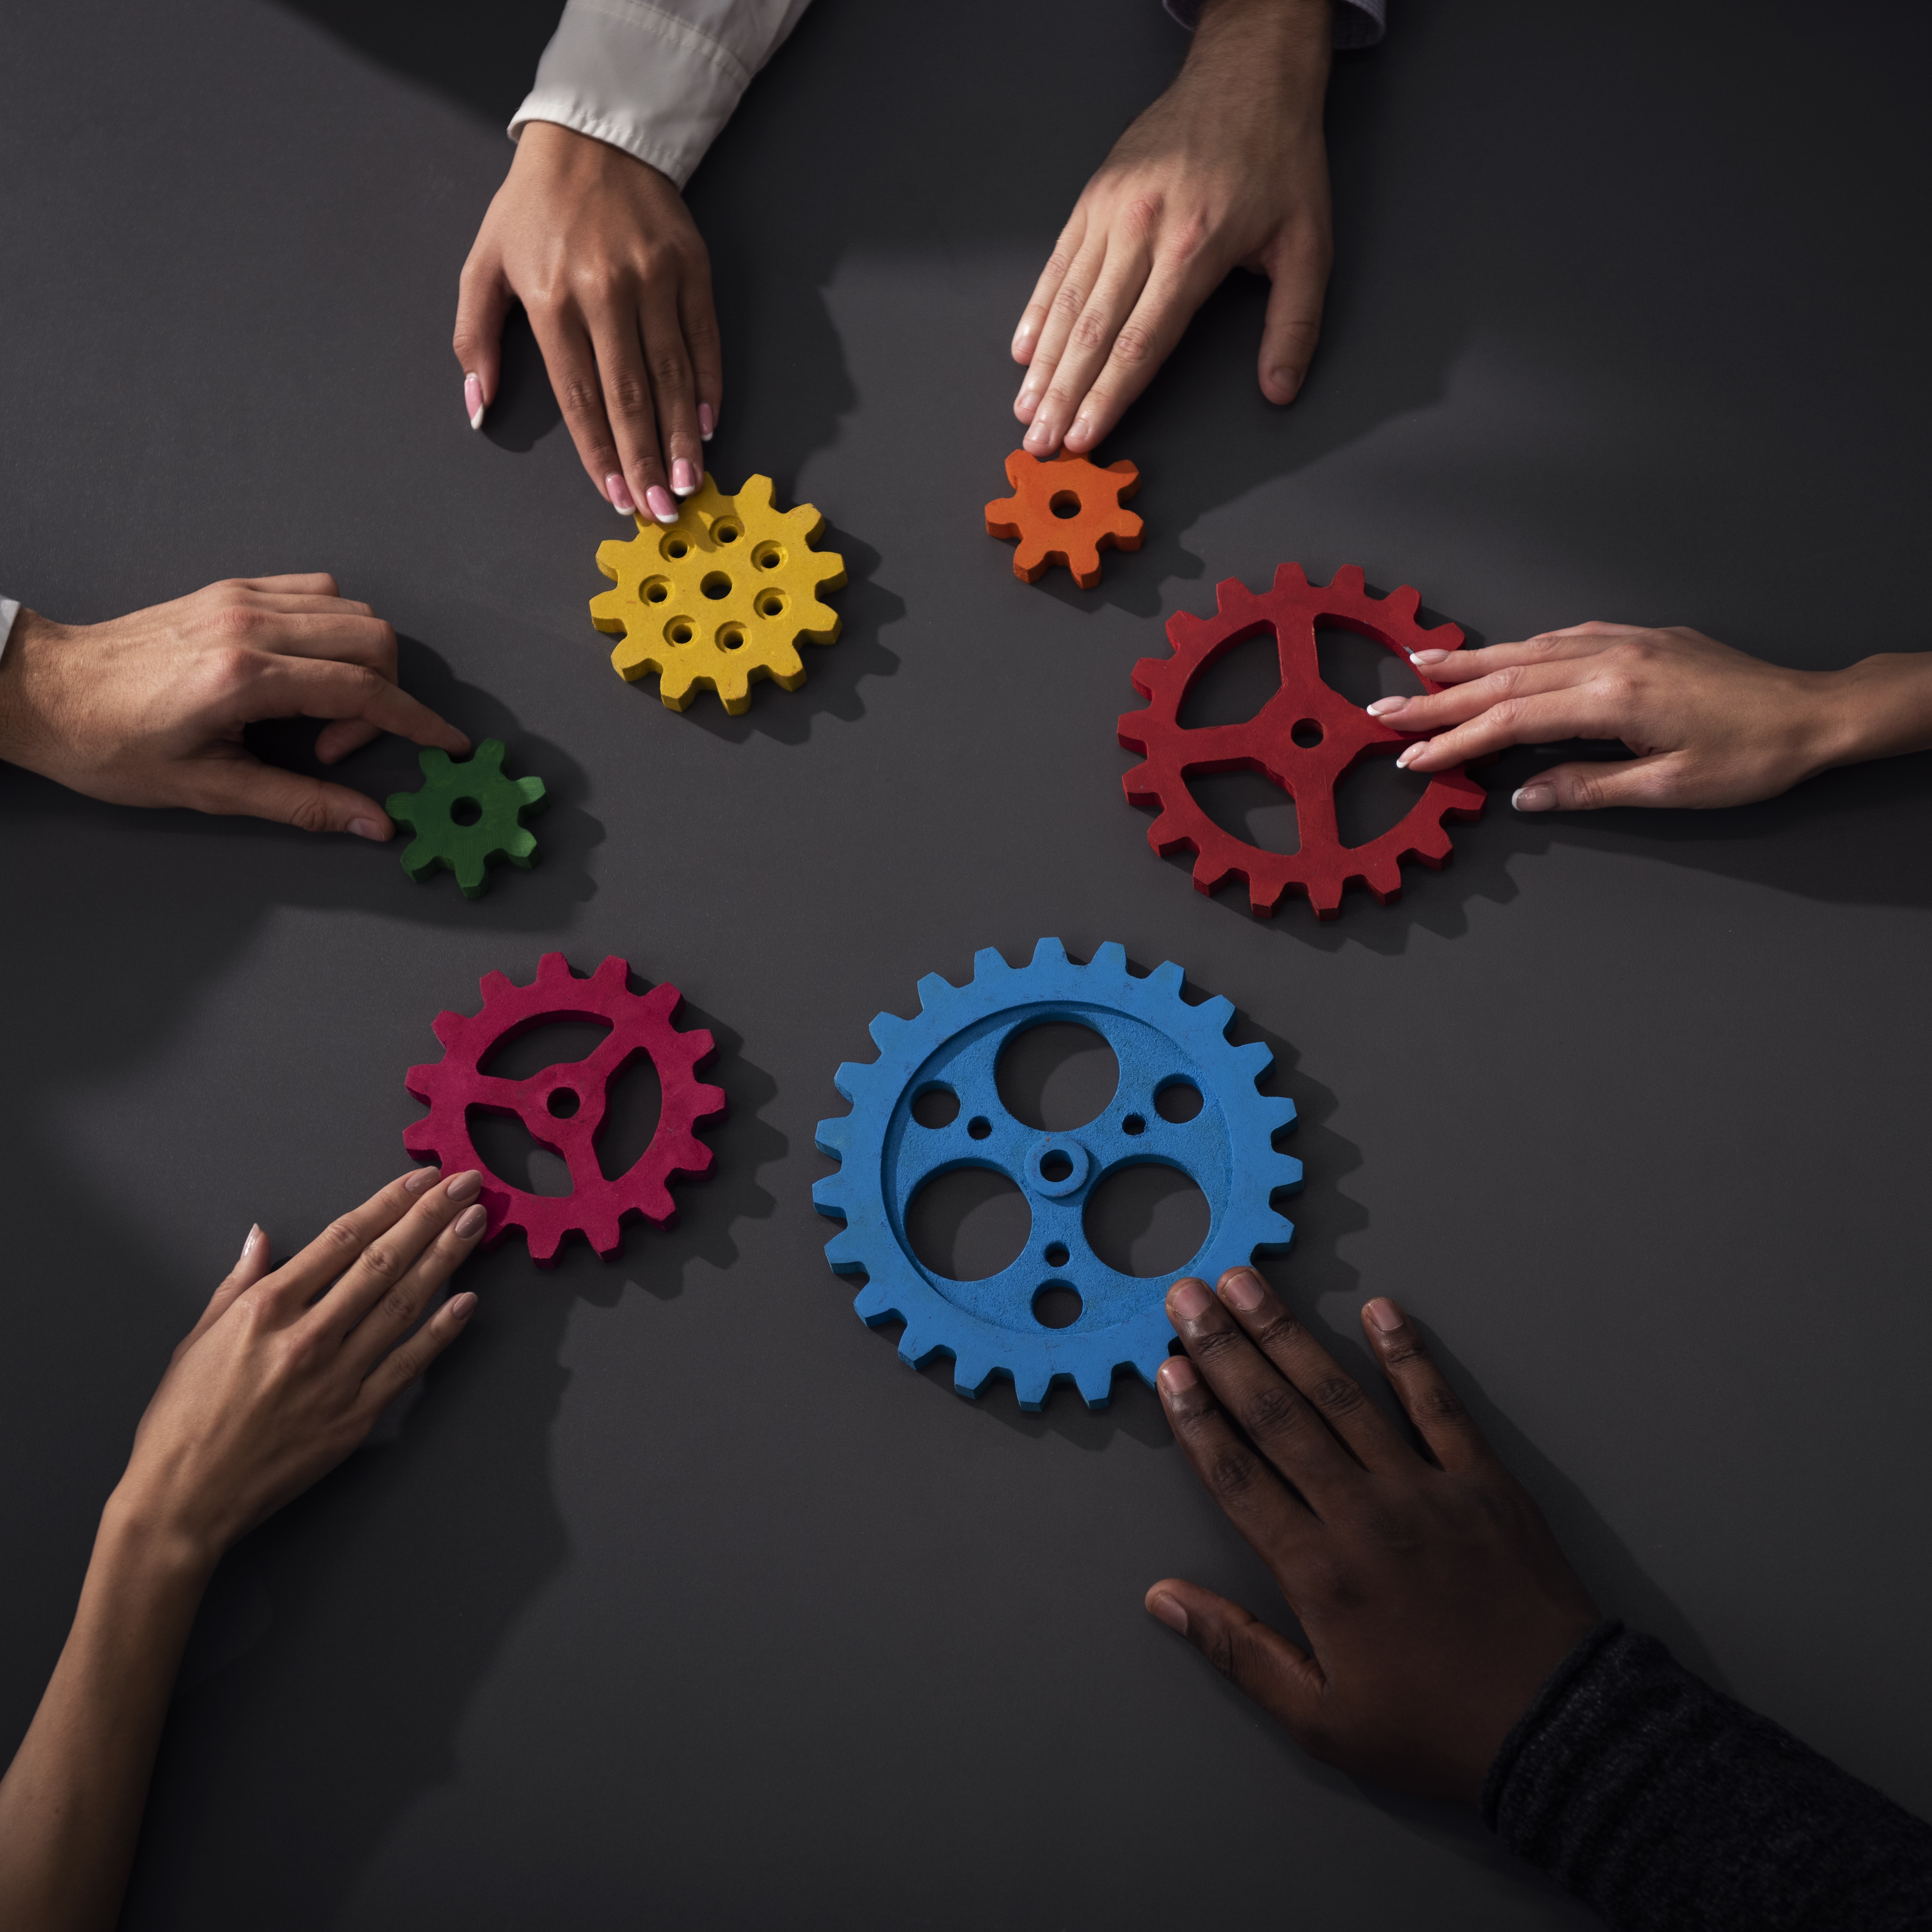 E-Learning Calon Ahli Pembangun Integritas